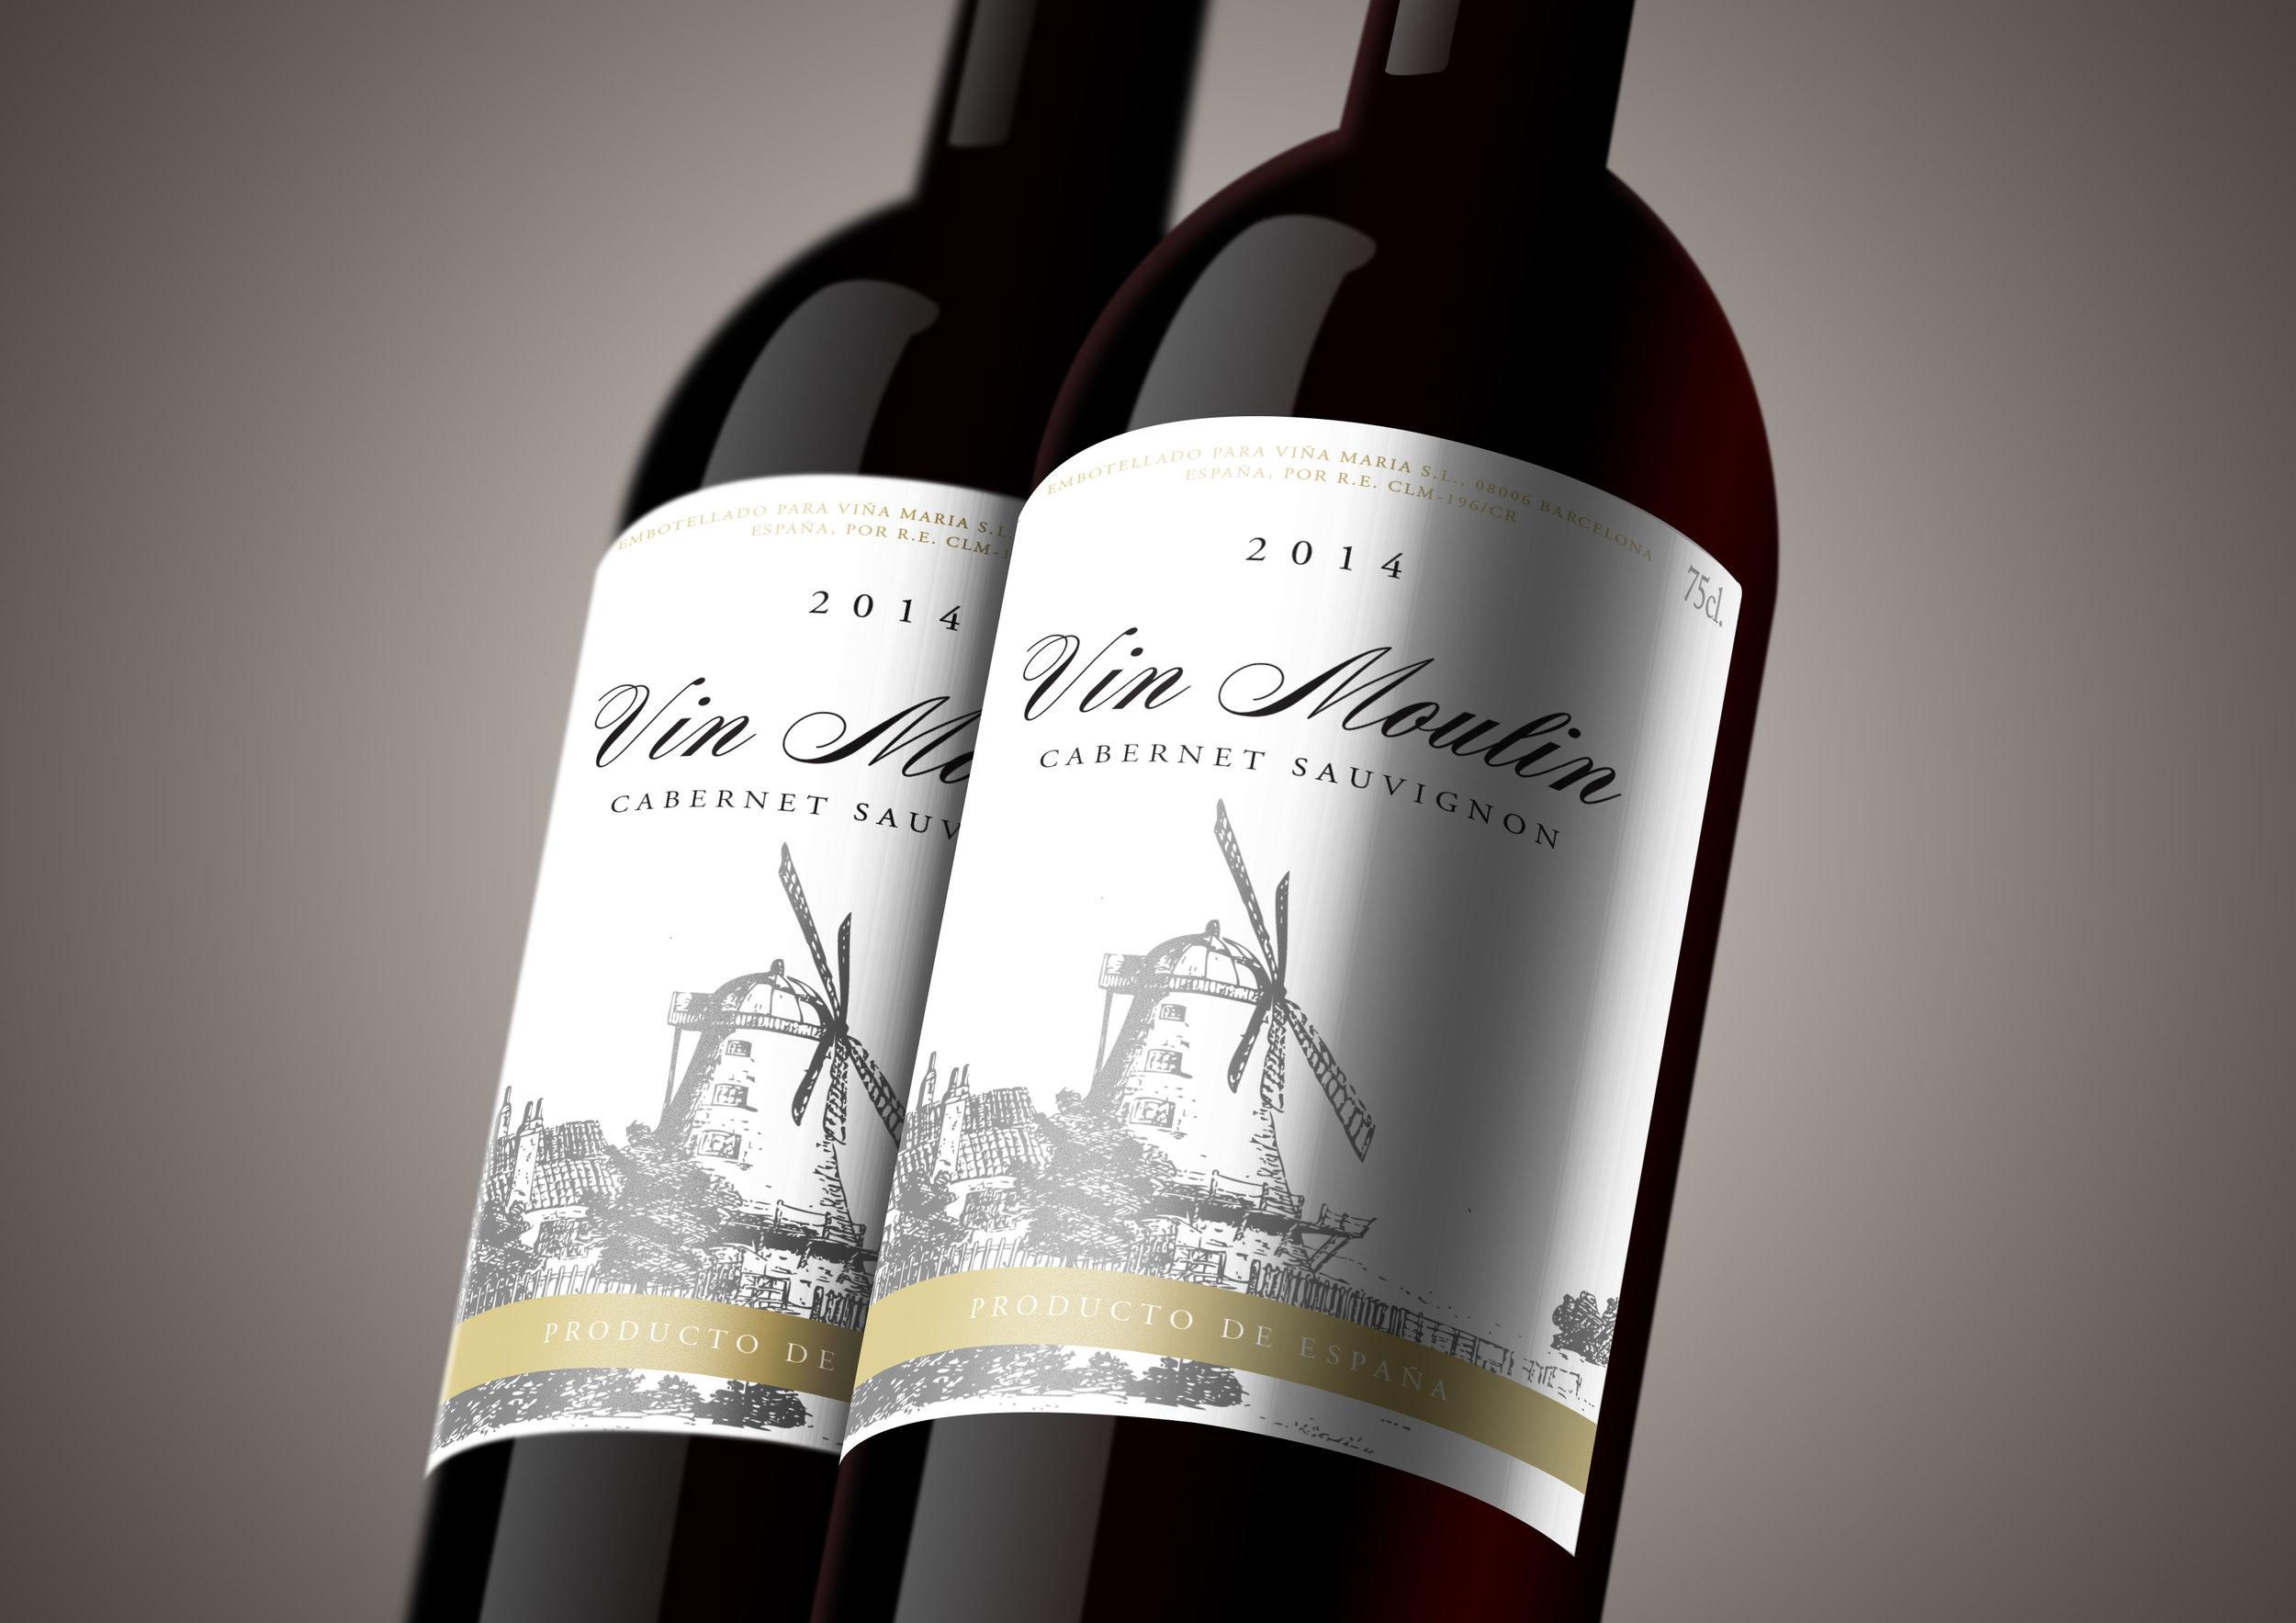 Vin Moulin 2 bottle shot.jpg